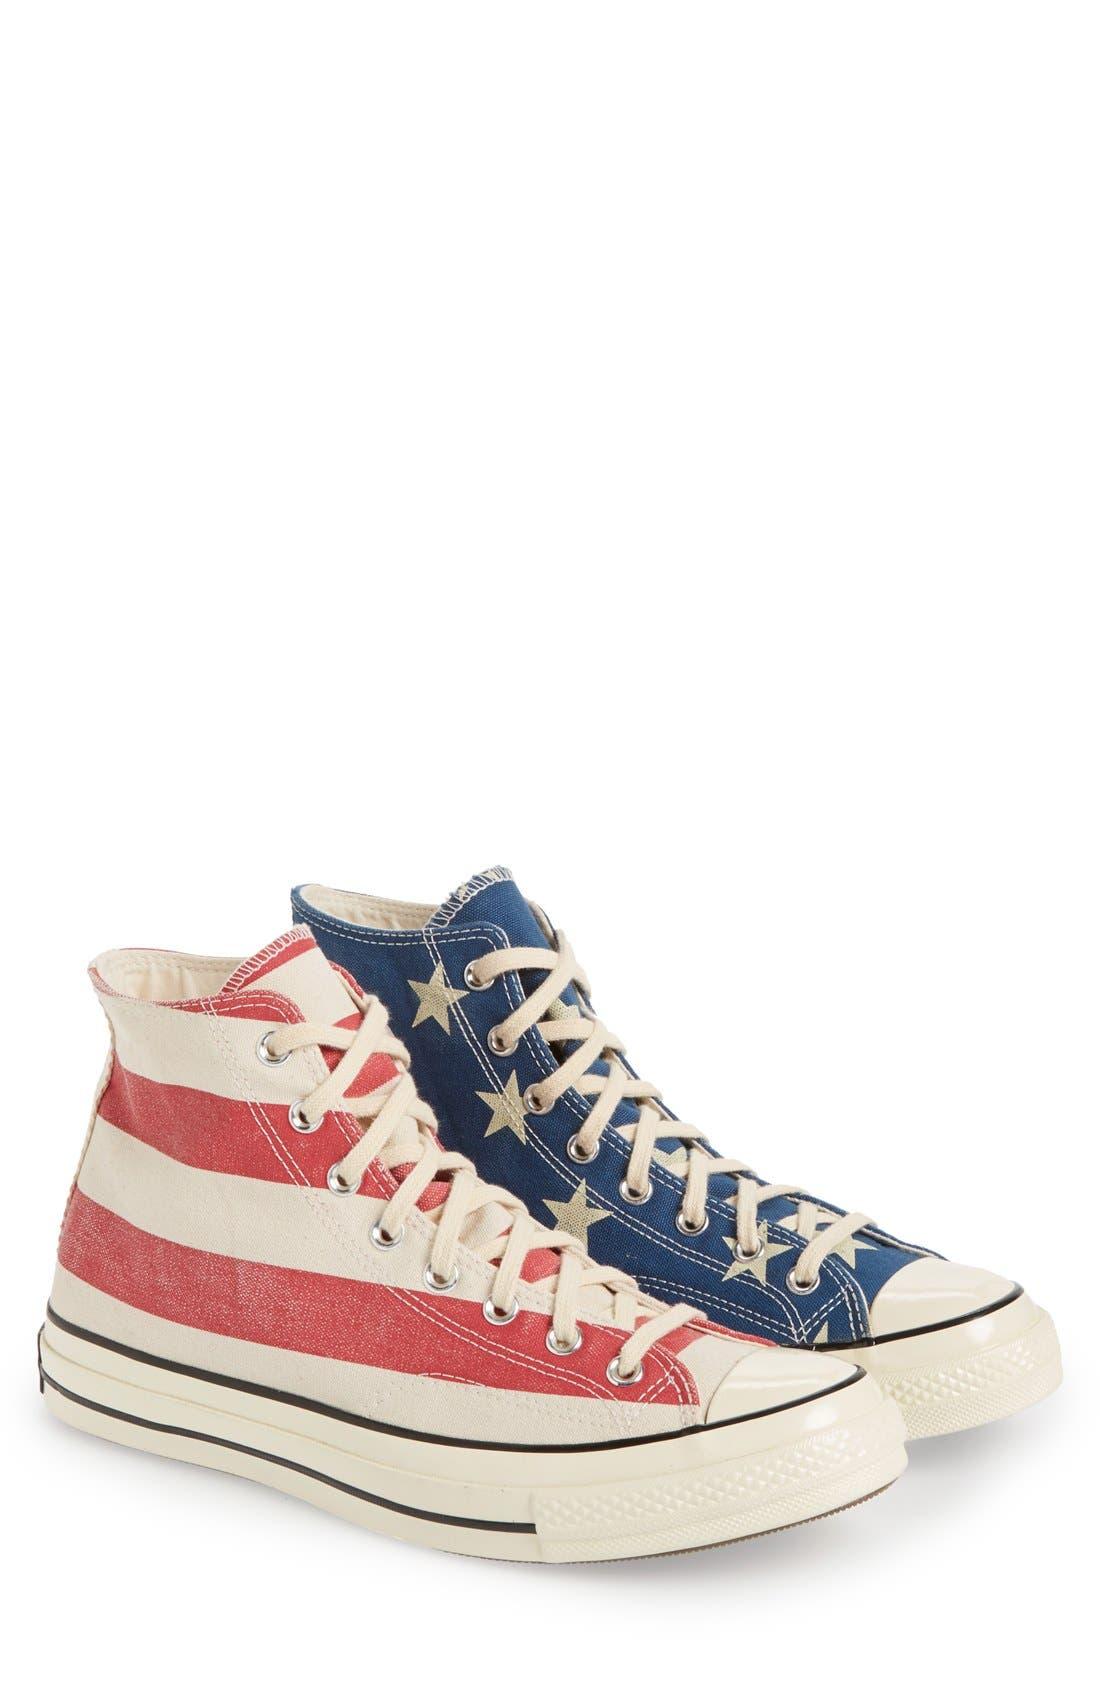 Chuck Taylor<sup>®</sup> All Star<sup>®</sup> '70 American Flag' Sneaker,                             Main thumbnail 1, color,                             604